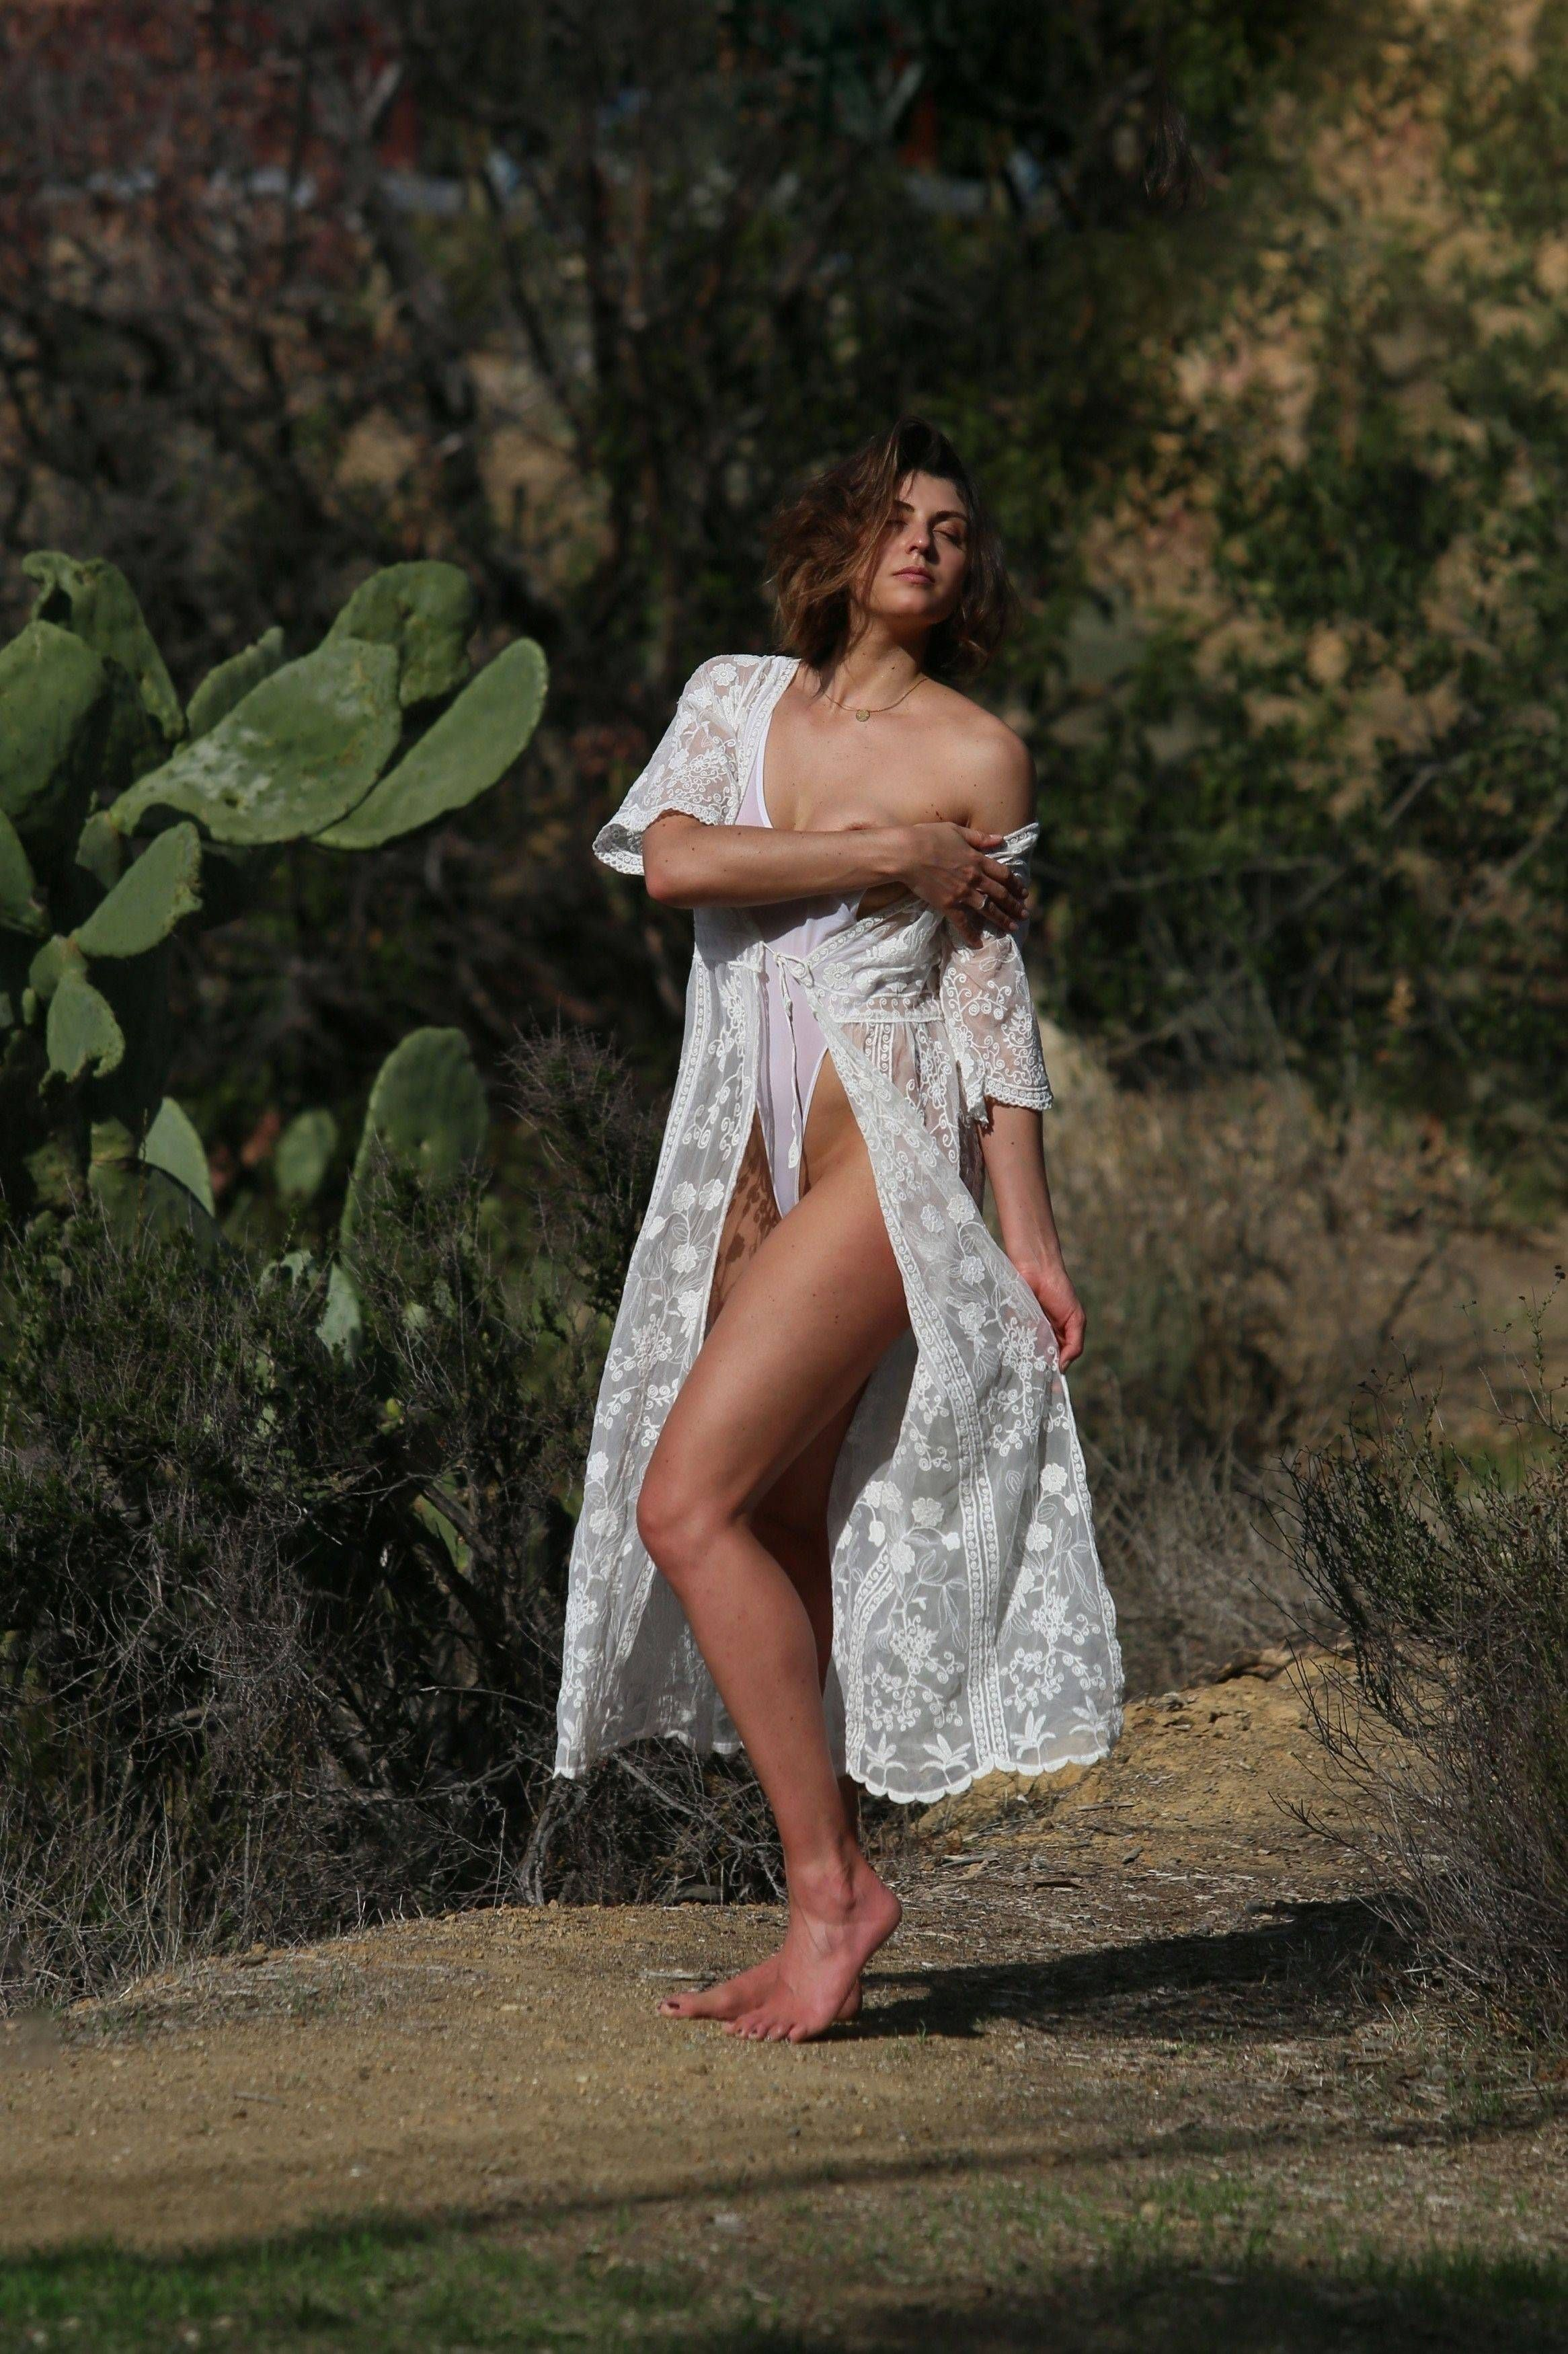 Aurelie Malta nude (88 photo) Hacked, iCloud, cameltoe